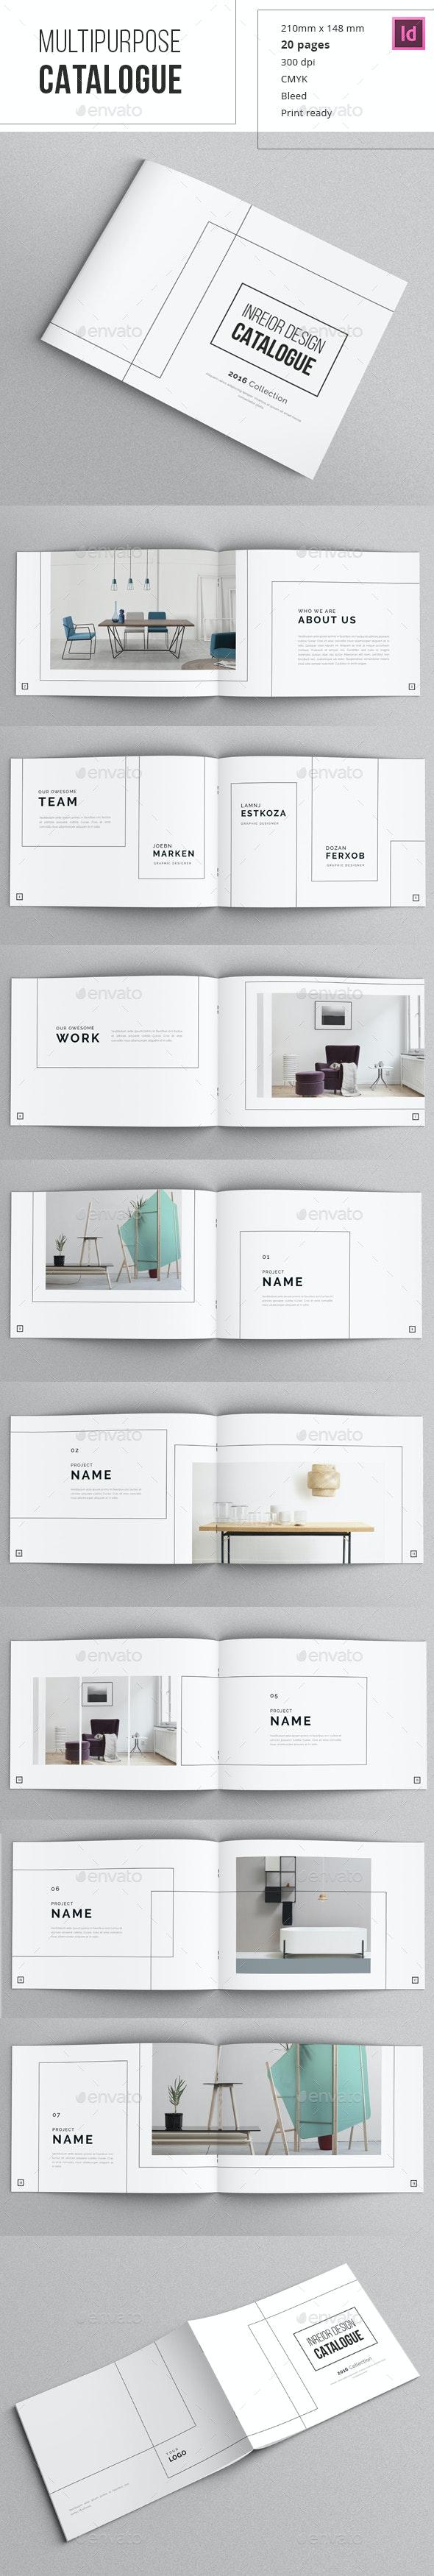 Minimal Indesign Catalogue - Catalogs Brochures